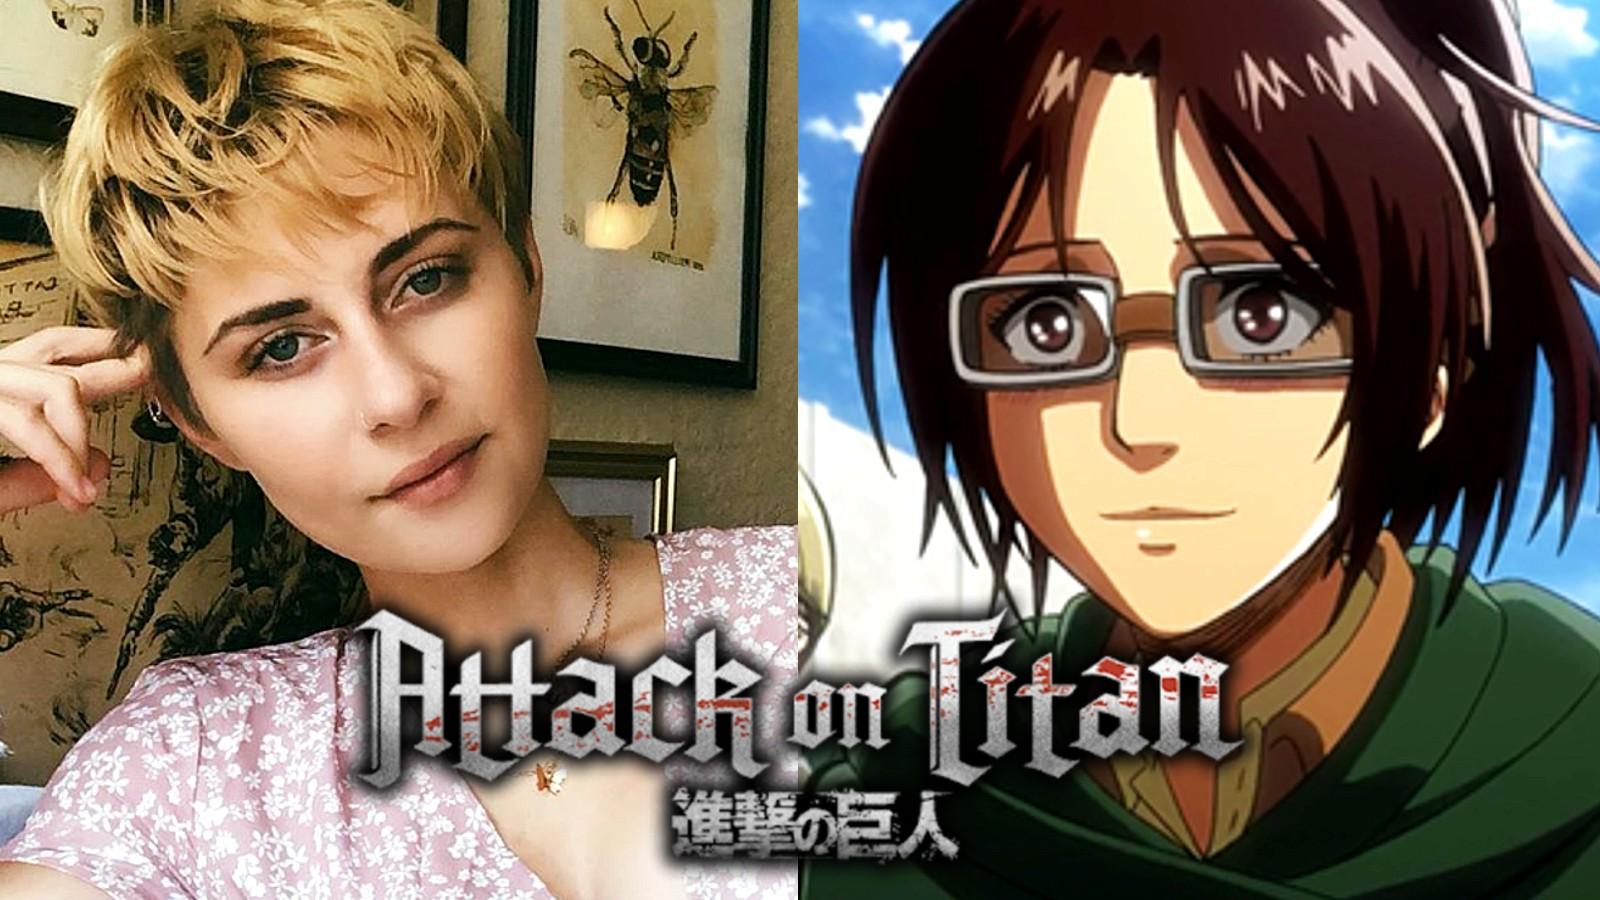 Attack of Titan Hanji cosplayer with AOT logo